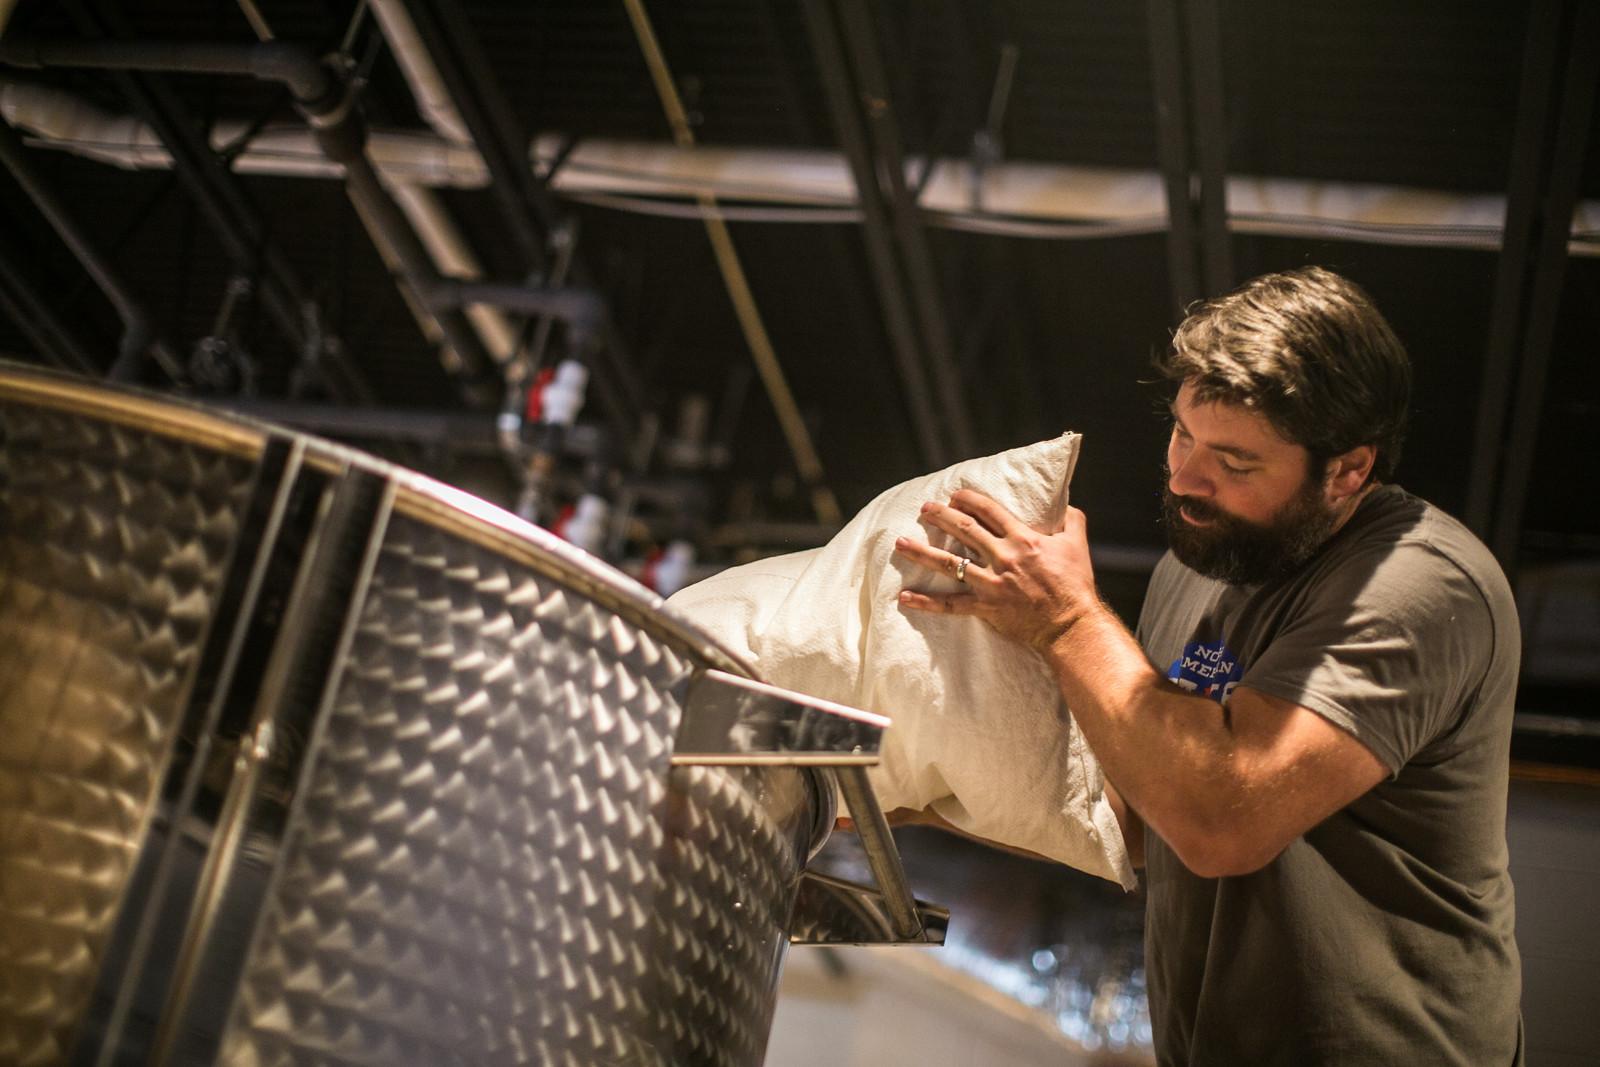 North American Sake, Charlottesville craft brewery